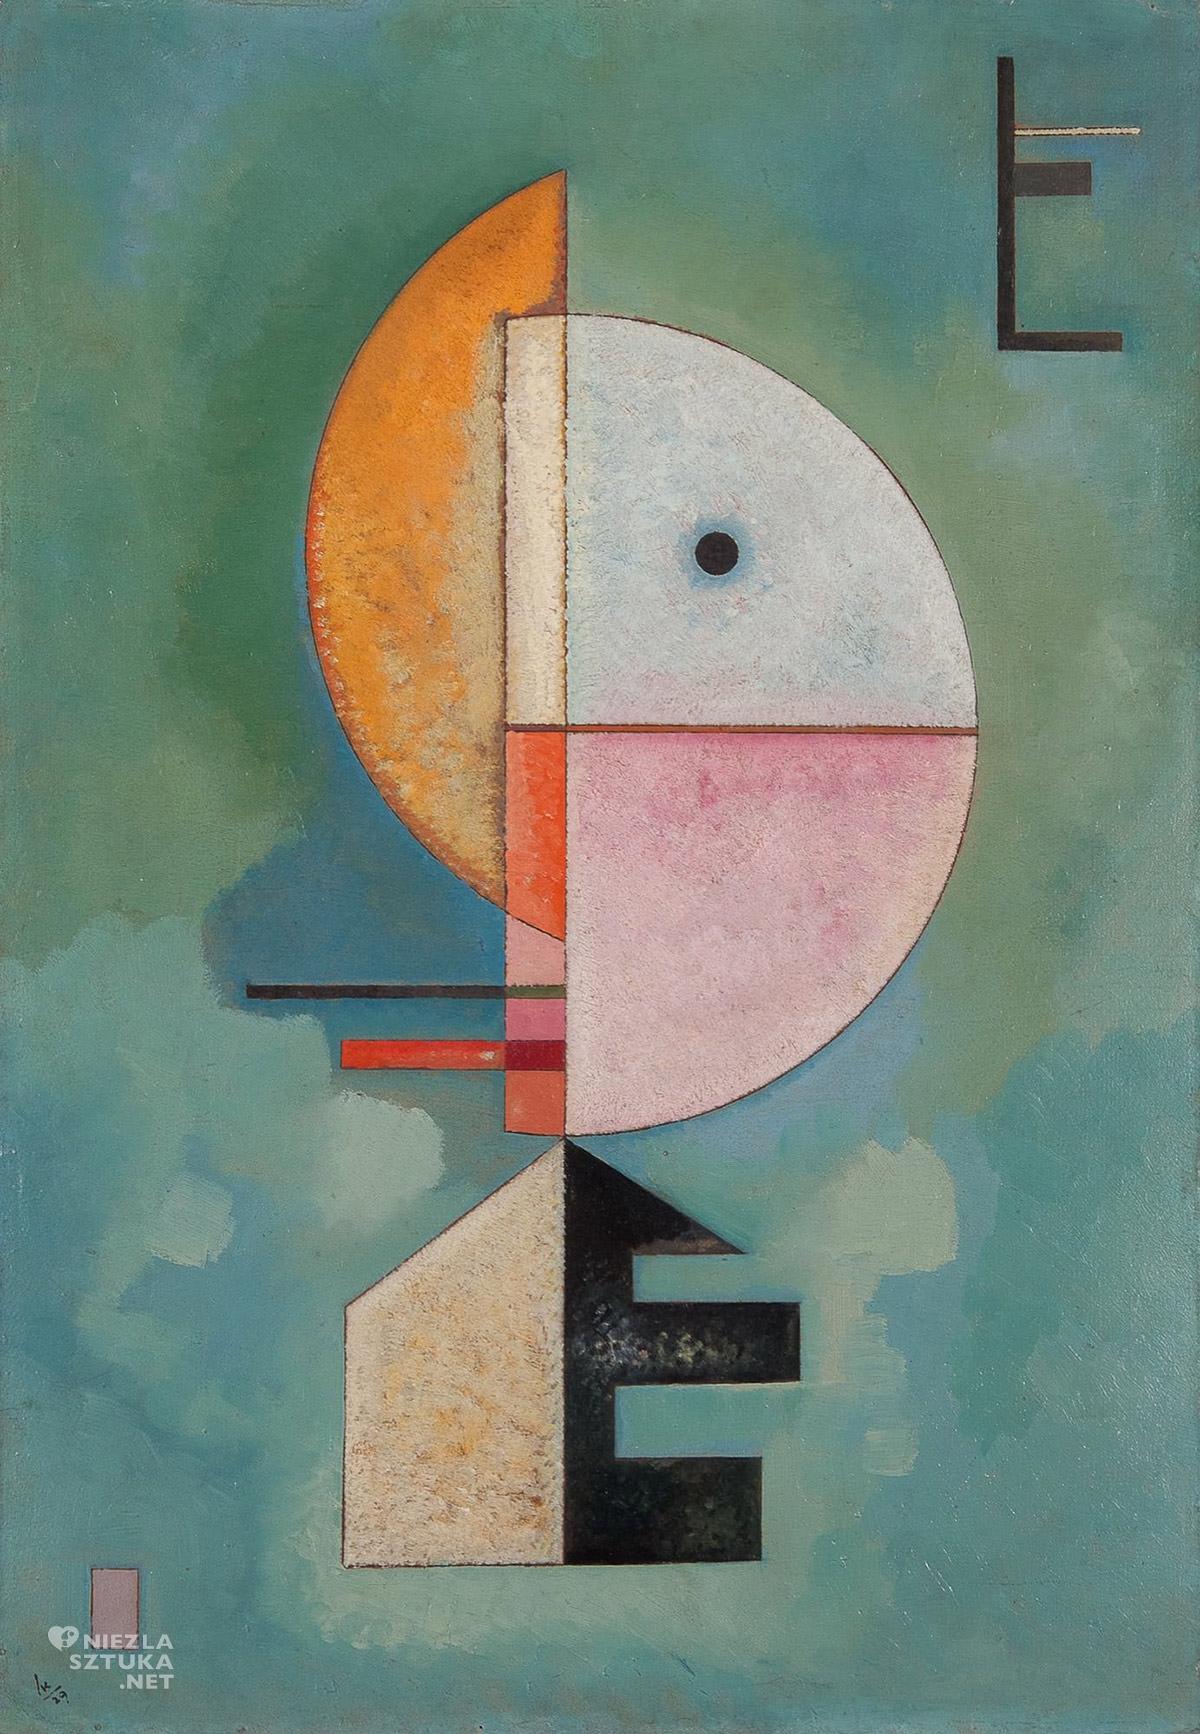 Wassily Kandinsky, Do góry, sztuka rosyjska, abstrakcja, Peggy Guggenheim Collection, Niezła Sztuka